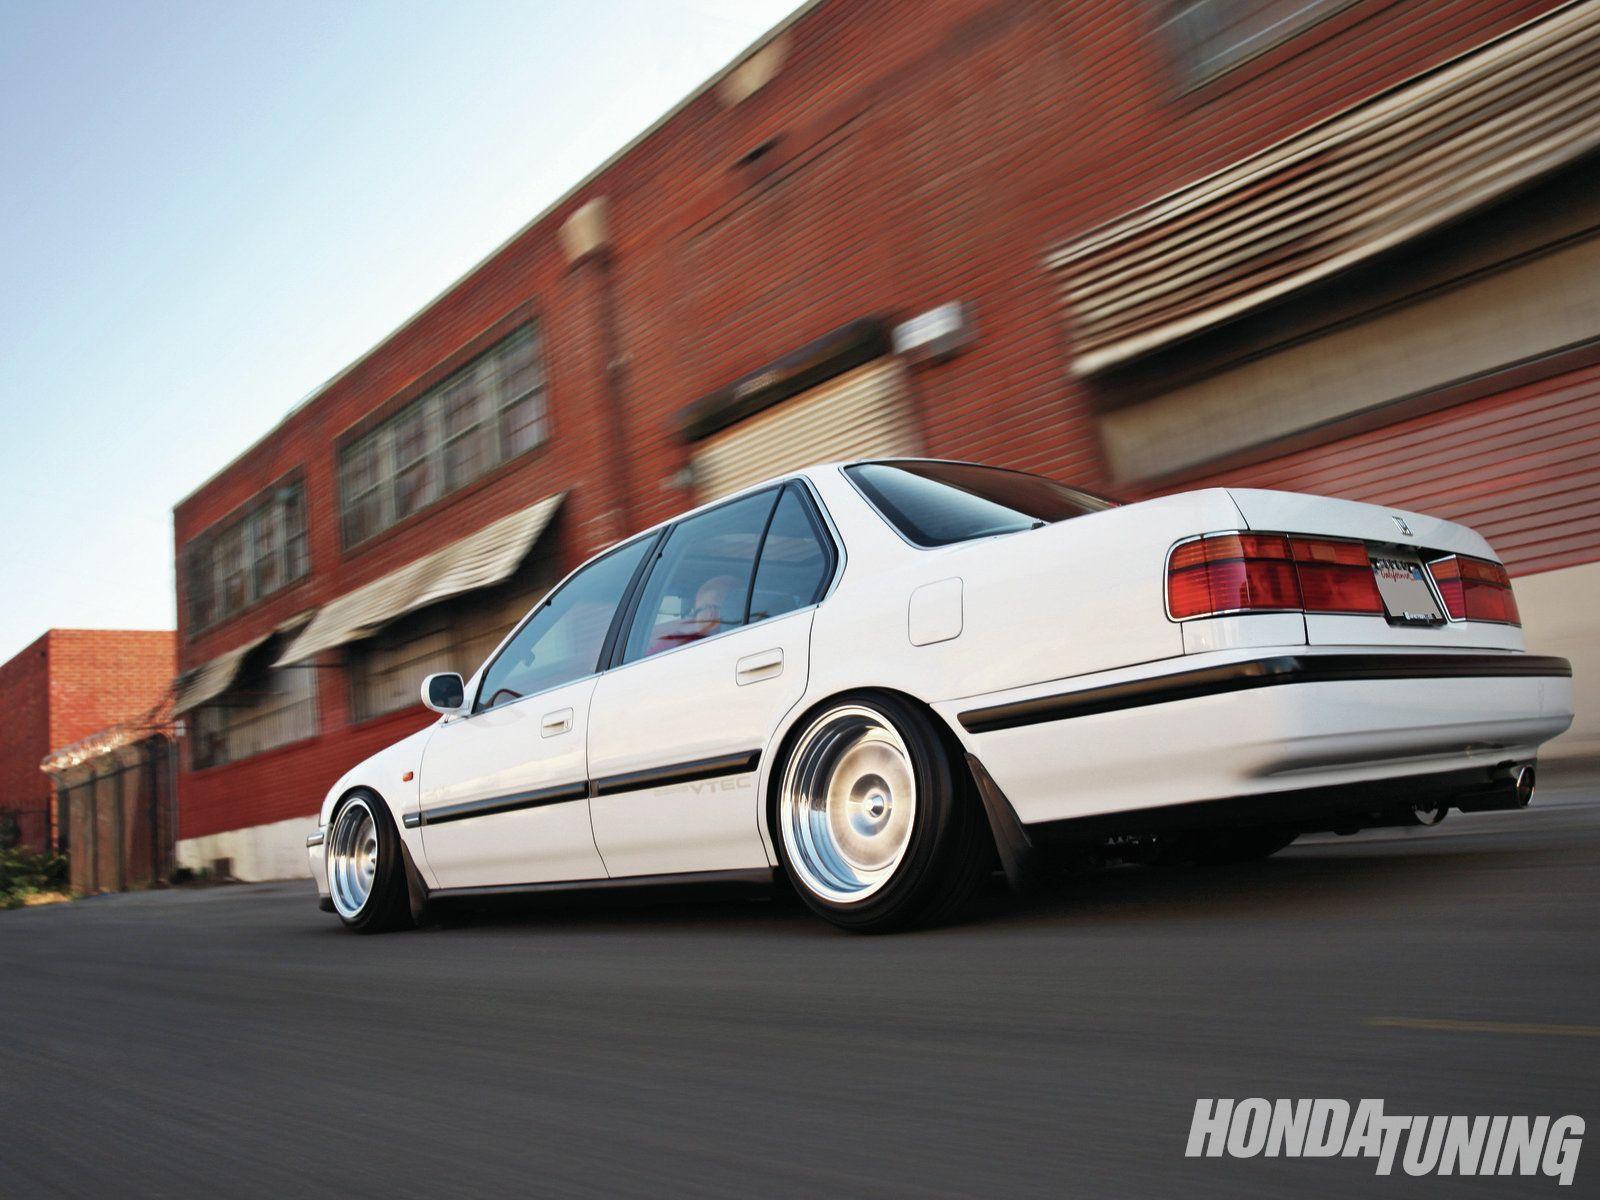 honda accord 91 ex  Cars  Pinterest  Honda accord Honda and Cars